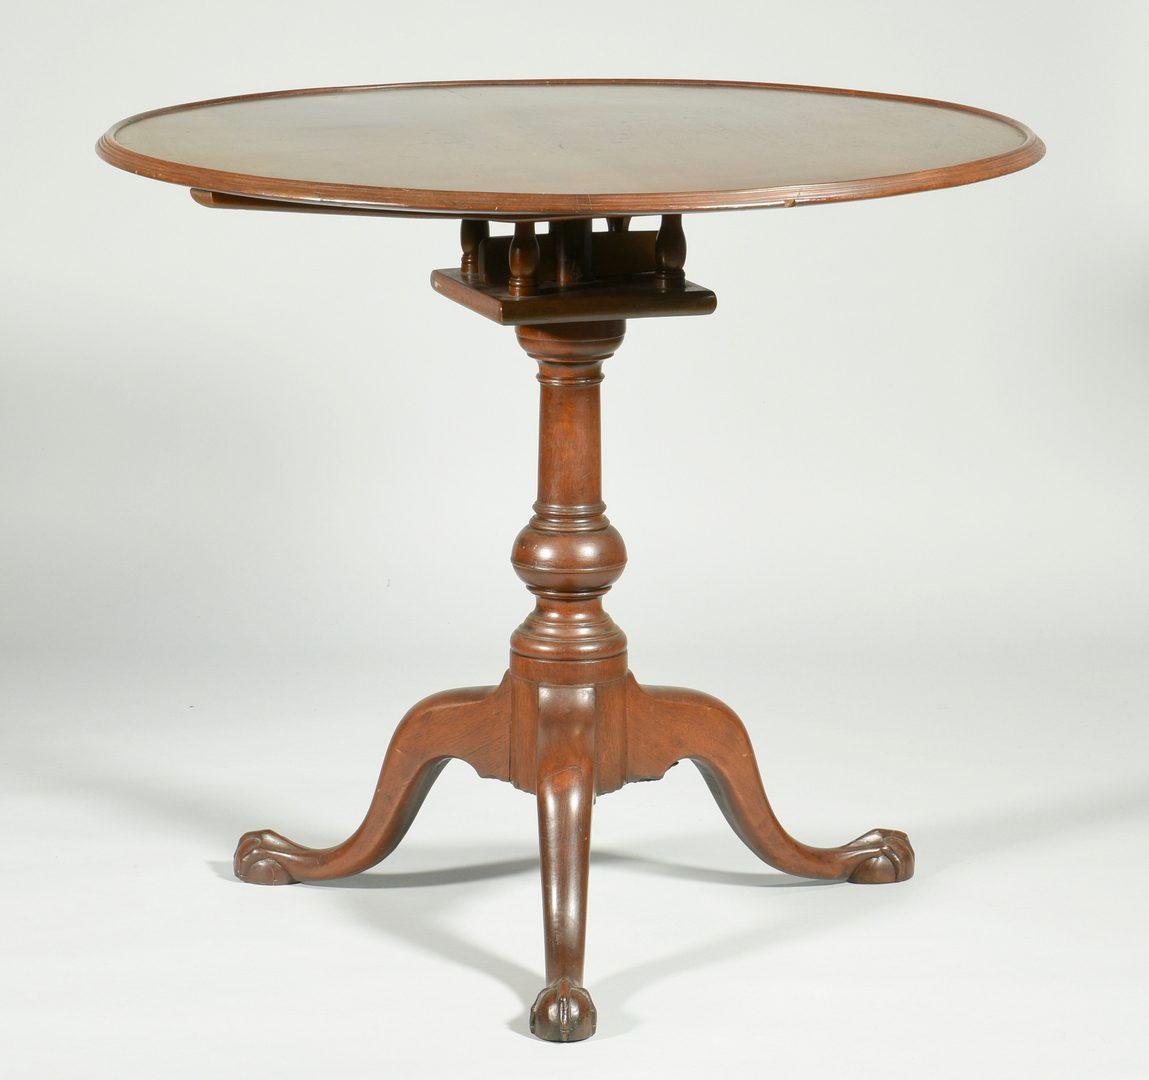 Lot 114: American Chippendale Tilt-top Tea Table